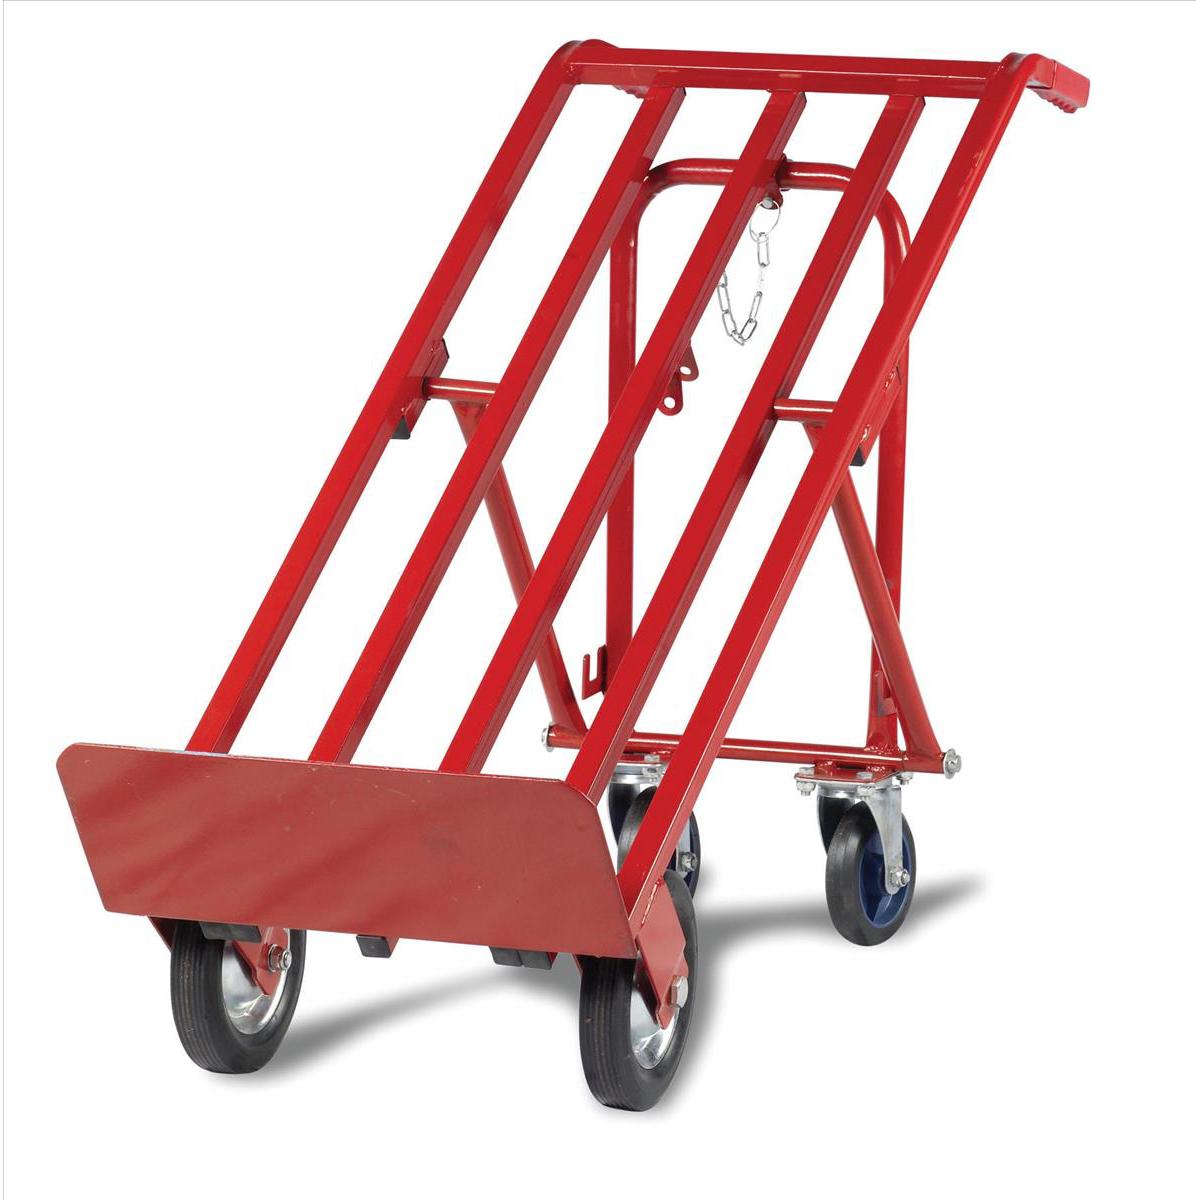 5 Star Facilities Sack Truck Heavy Duty 3 Position Steel Frame Double Rear Castors Capacity 300kg Red